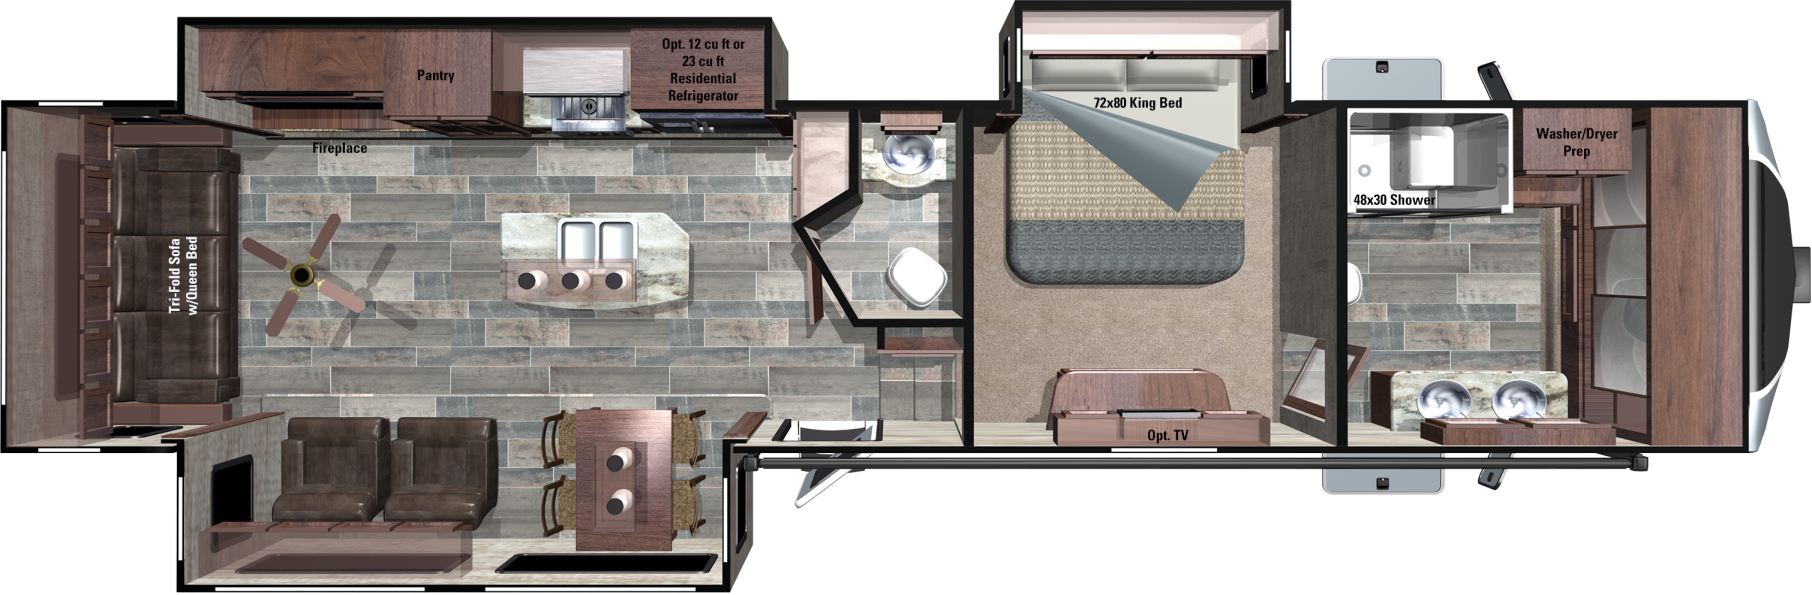 3X397FBS Floorplan